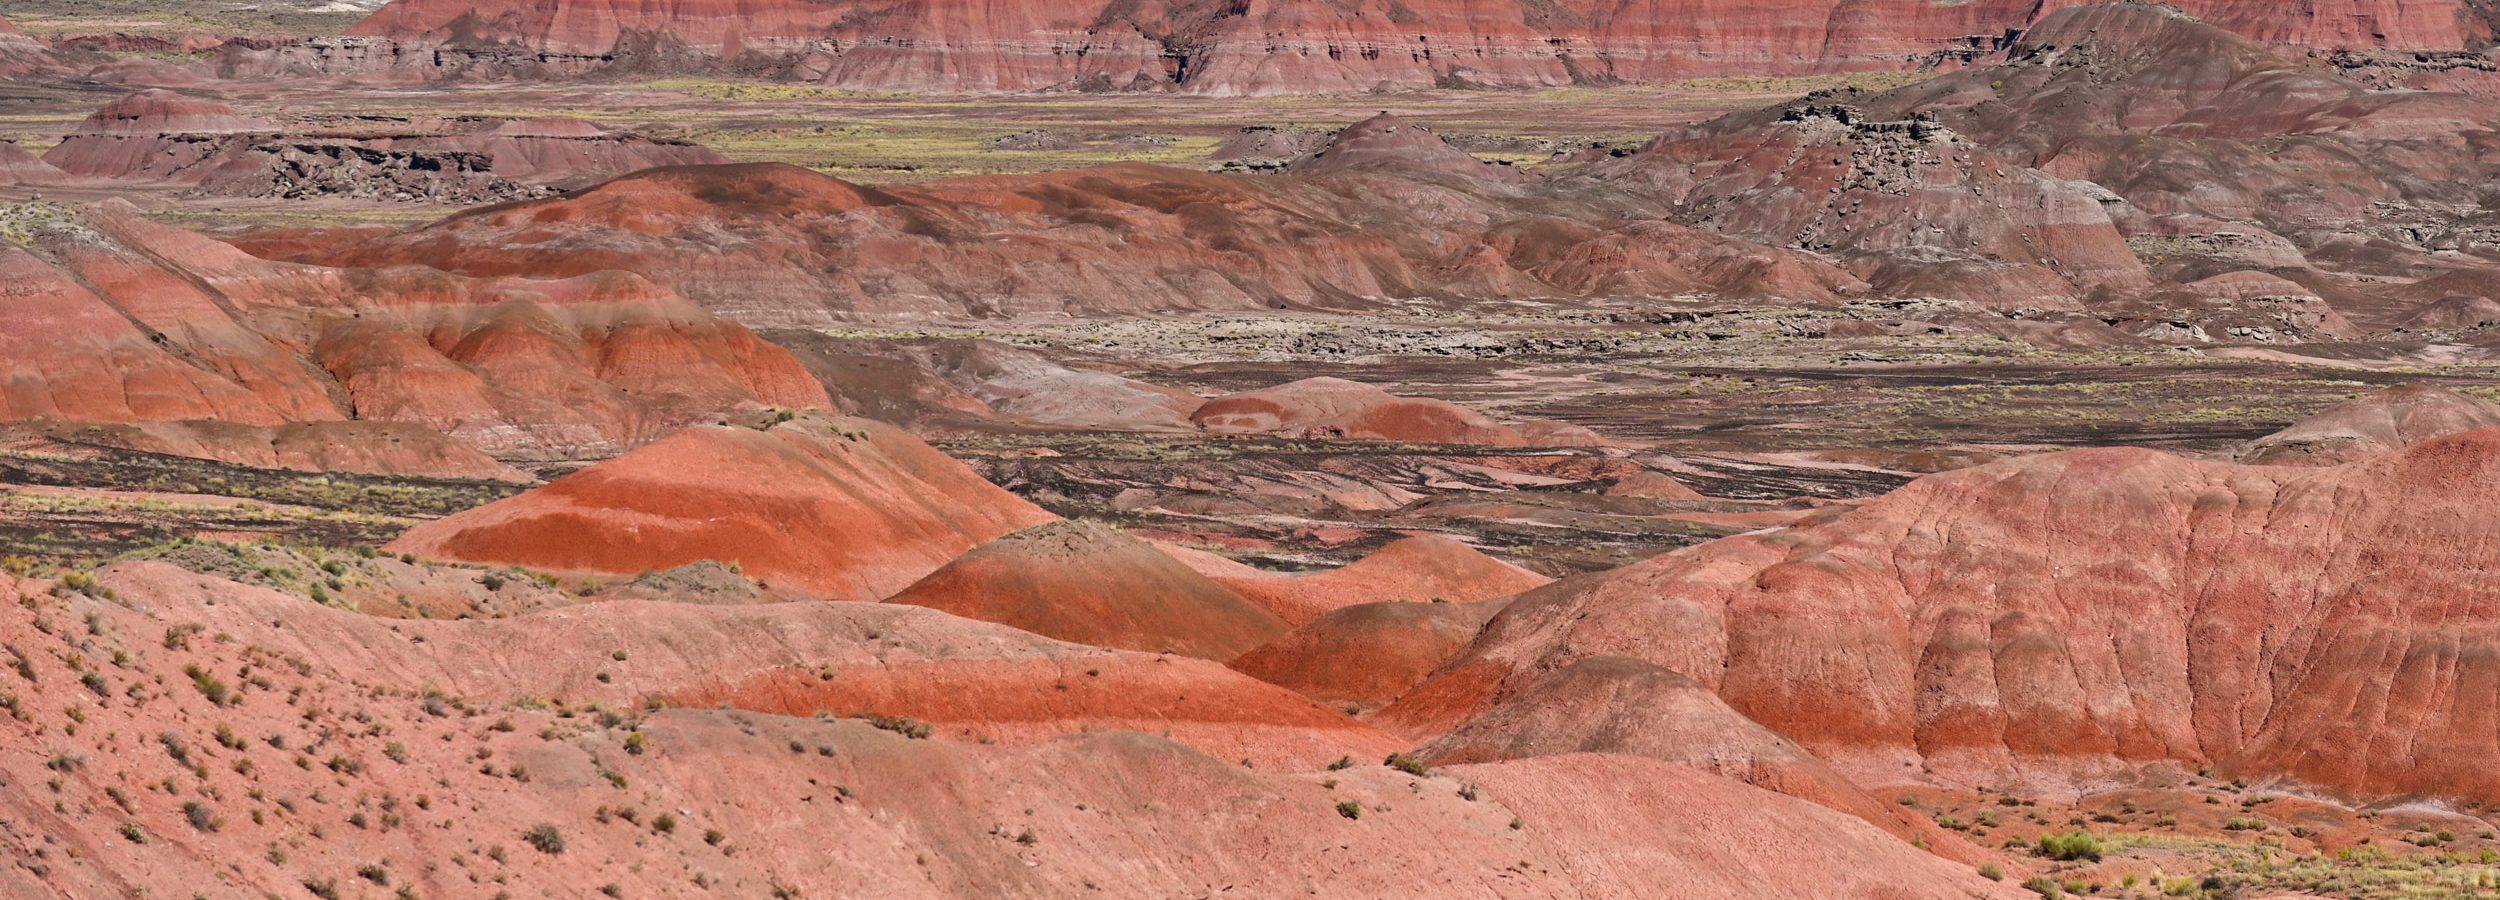 Painted Desert, Petrified Forest National Park, Arizona, USA